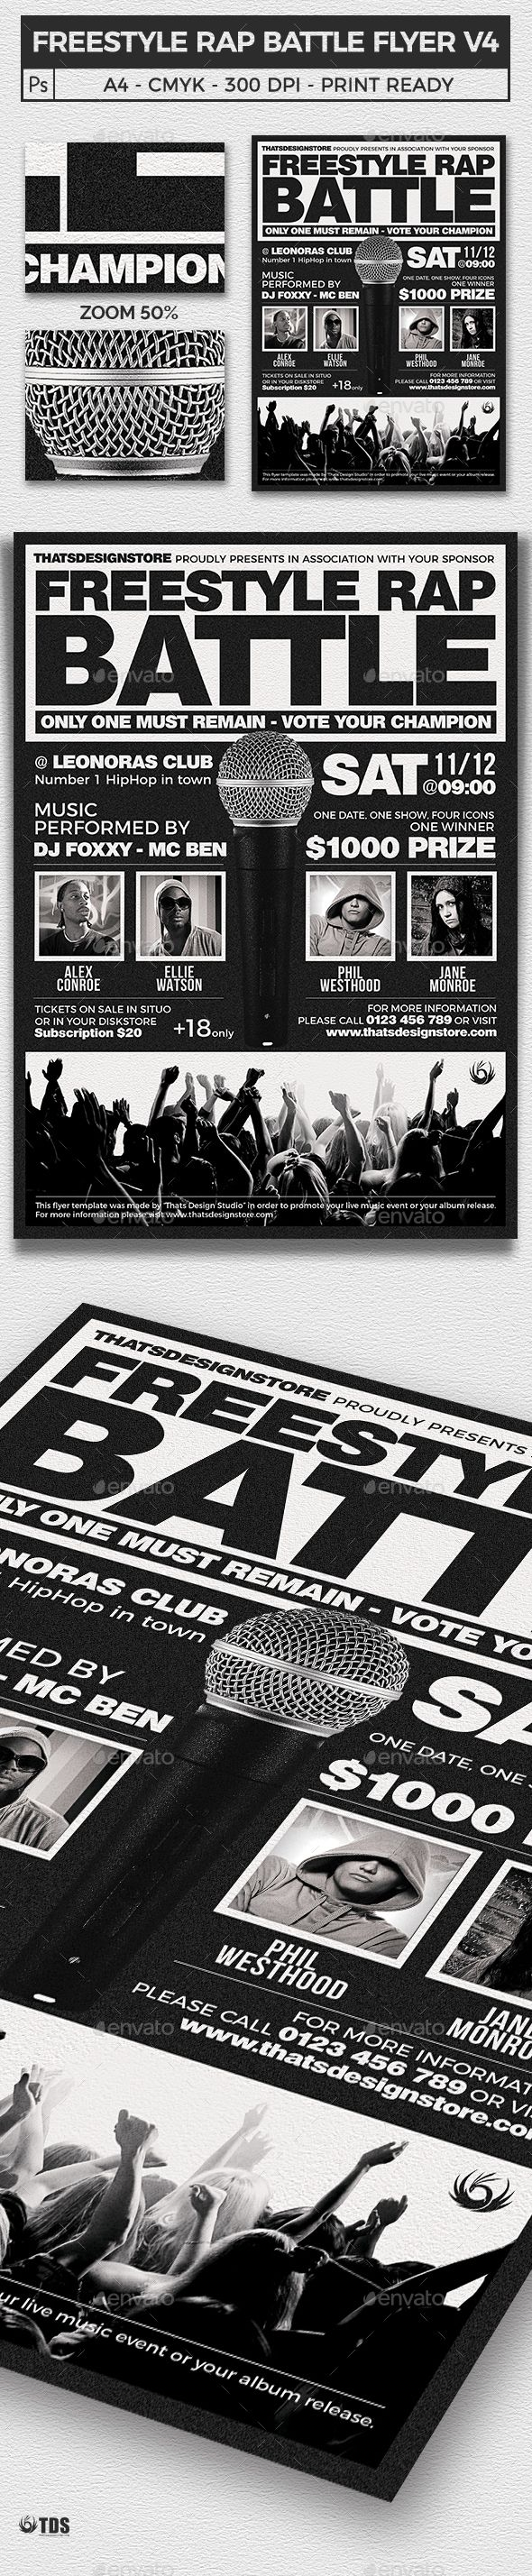 Freestyle Rap Battle Flyer Template V4